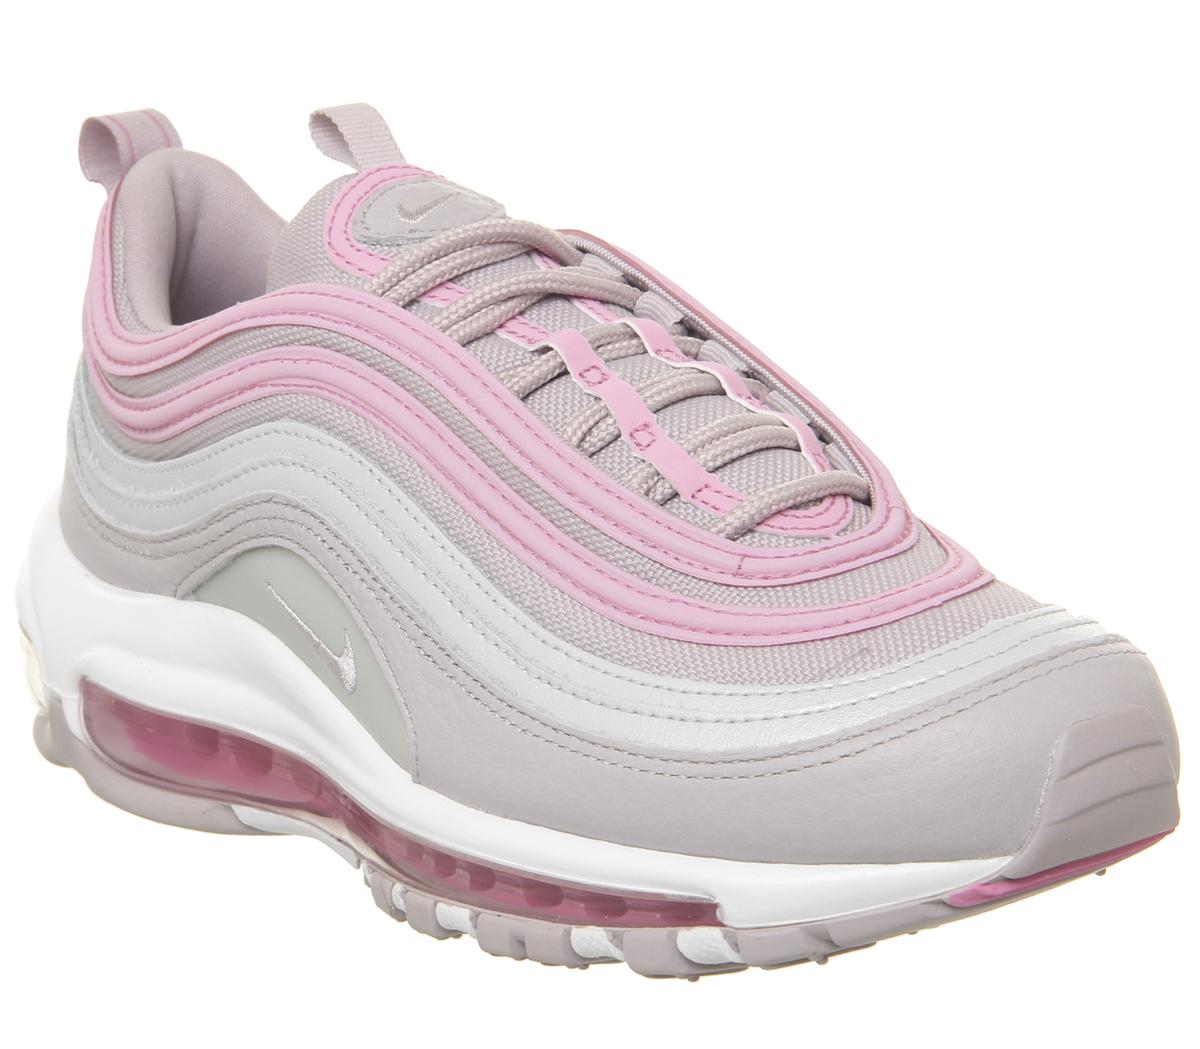 Nike air max 97 rosa trainers